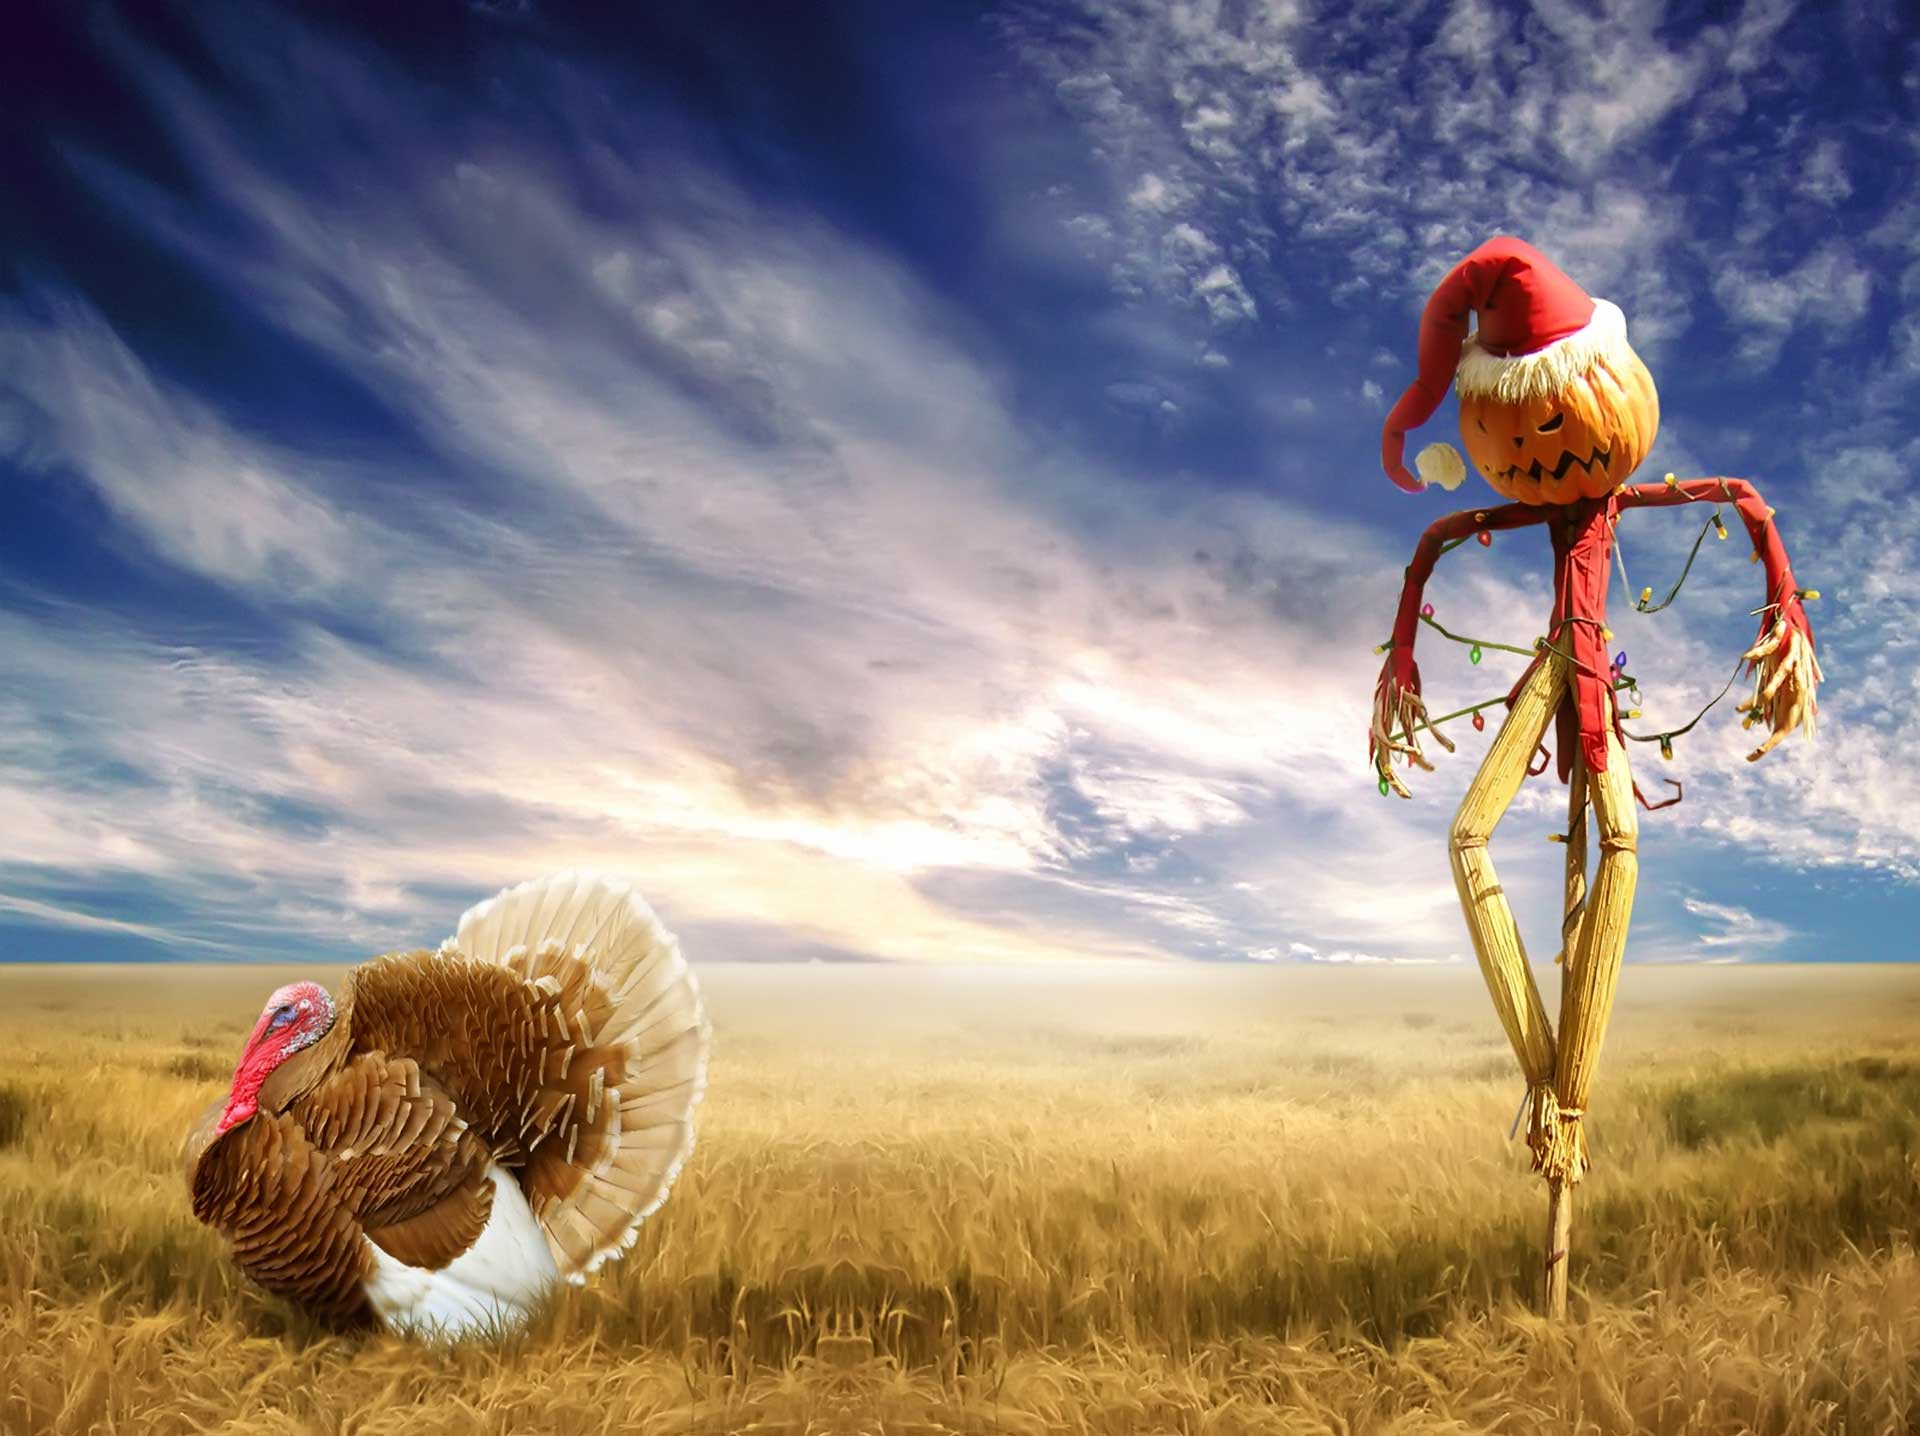 Thanksgiving wallpaper, turkey, scarecrow, jack-o-lantern, Christmas lights, santa suit